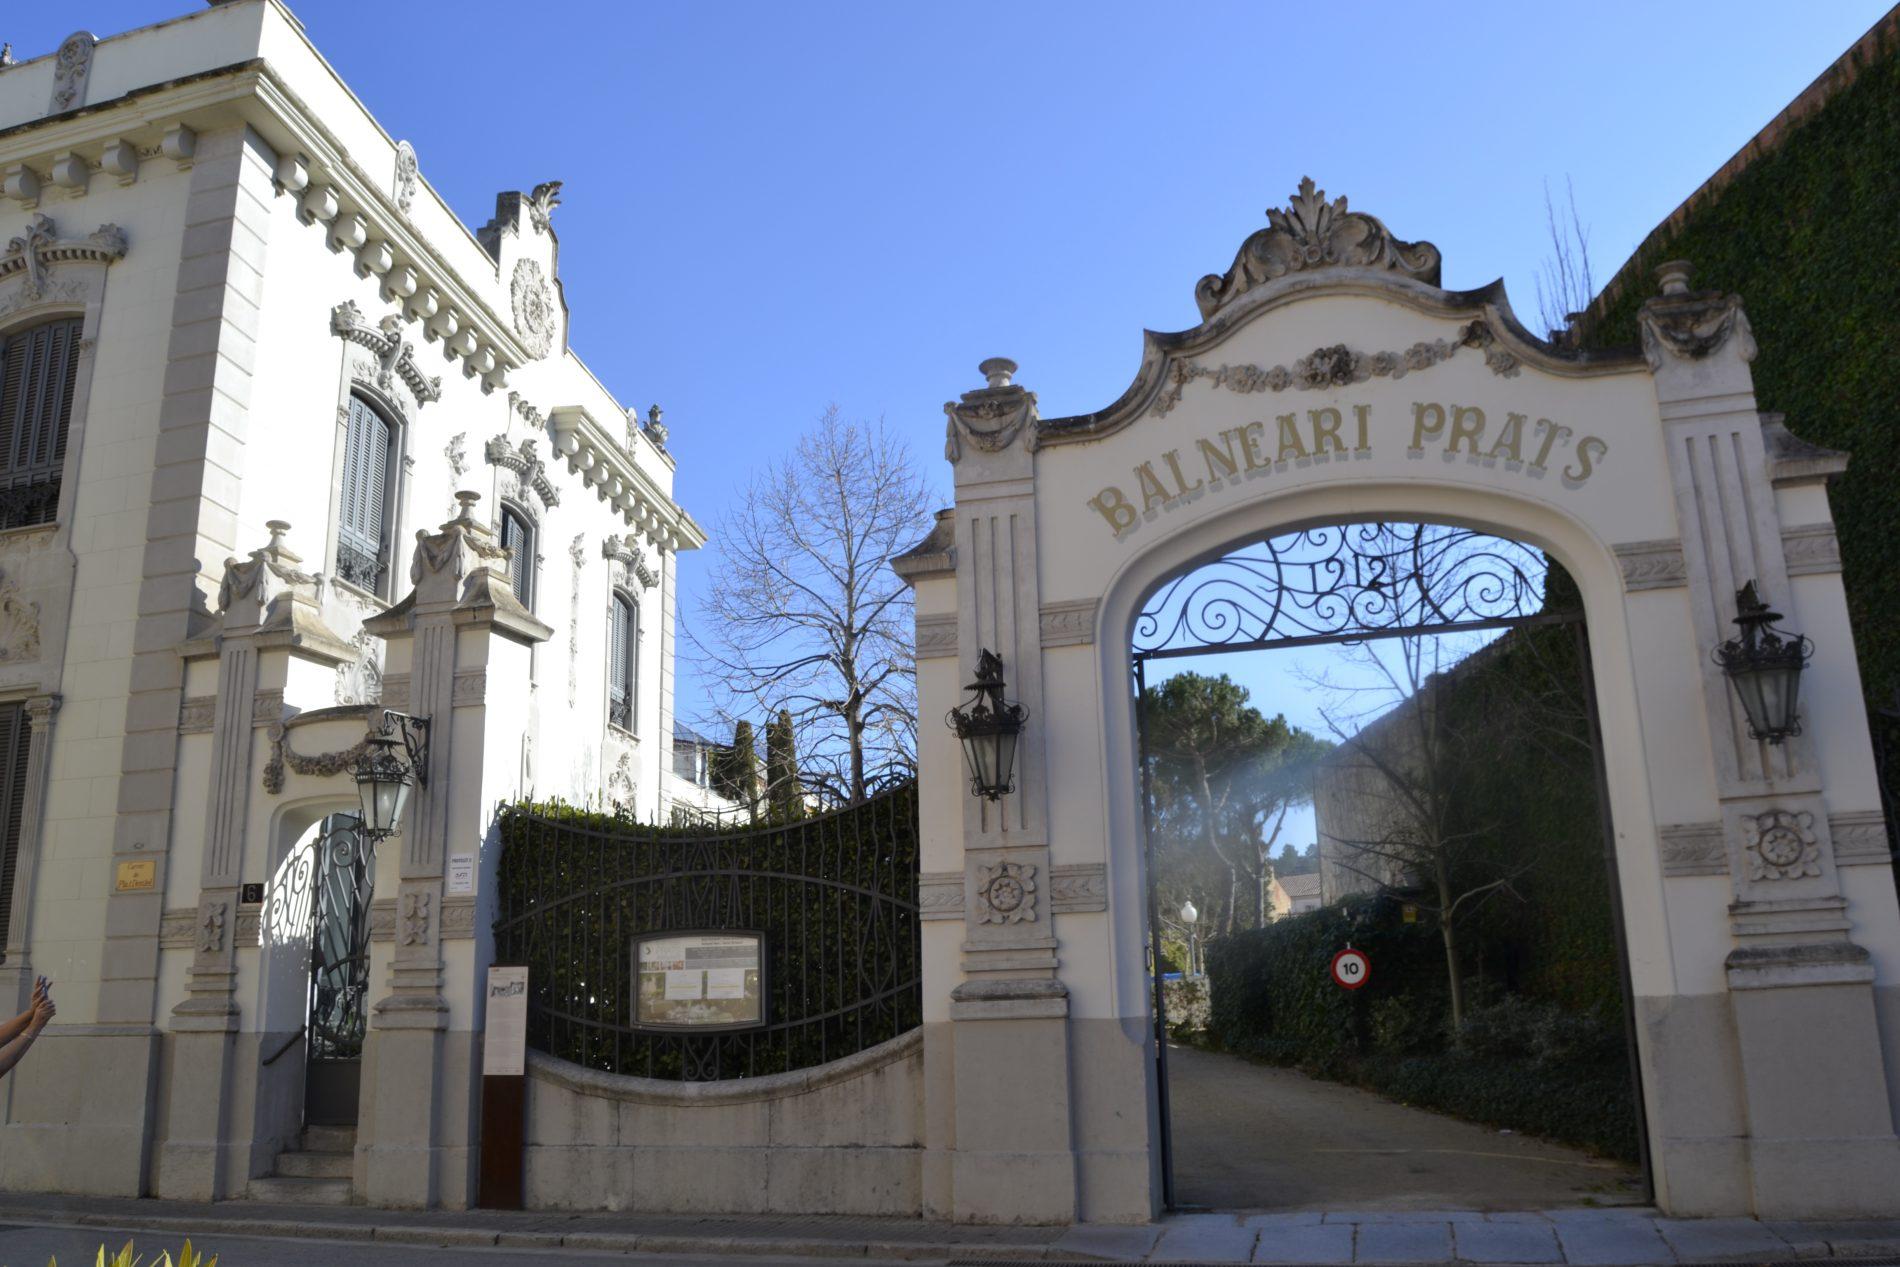 Balneari Prats a Caldes